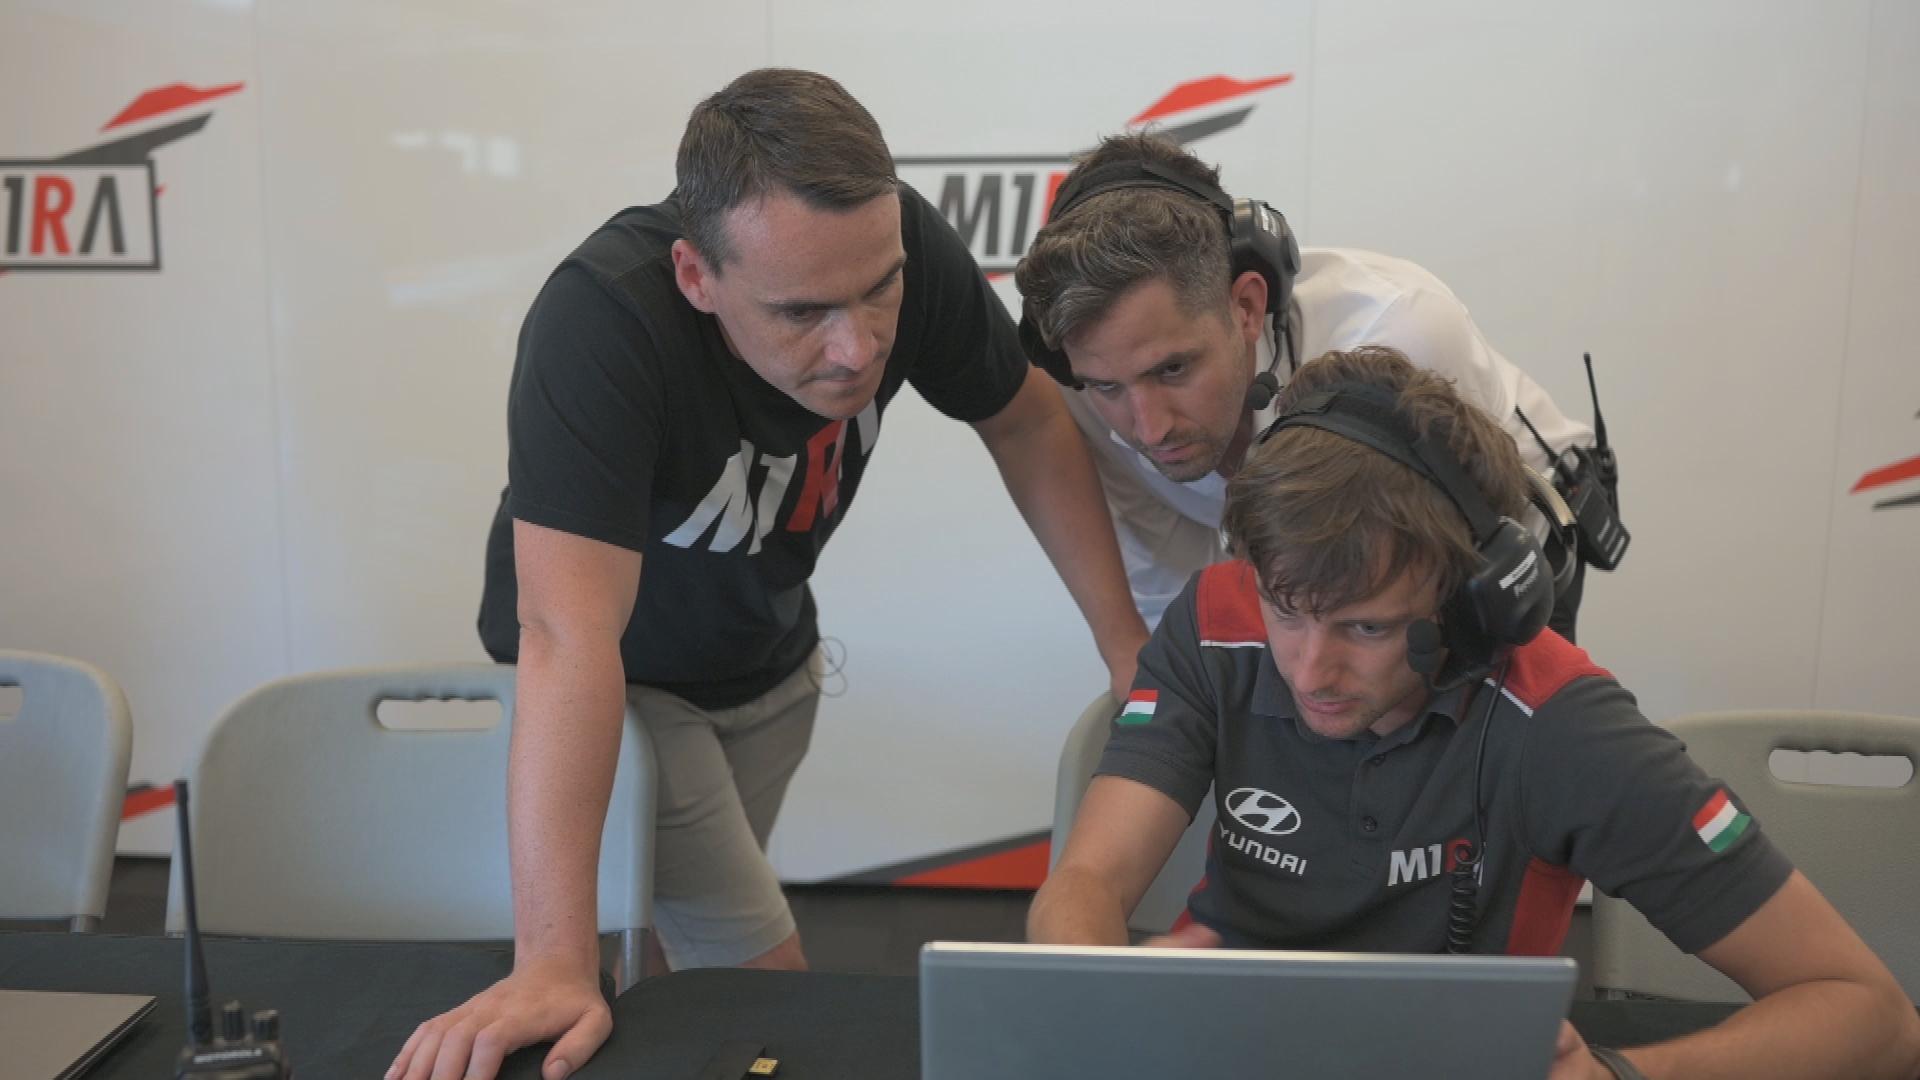 Fotó: M1RA Motorsport